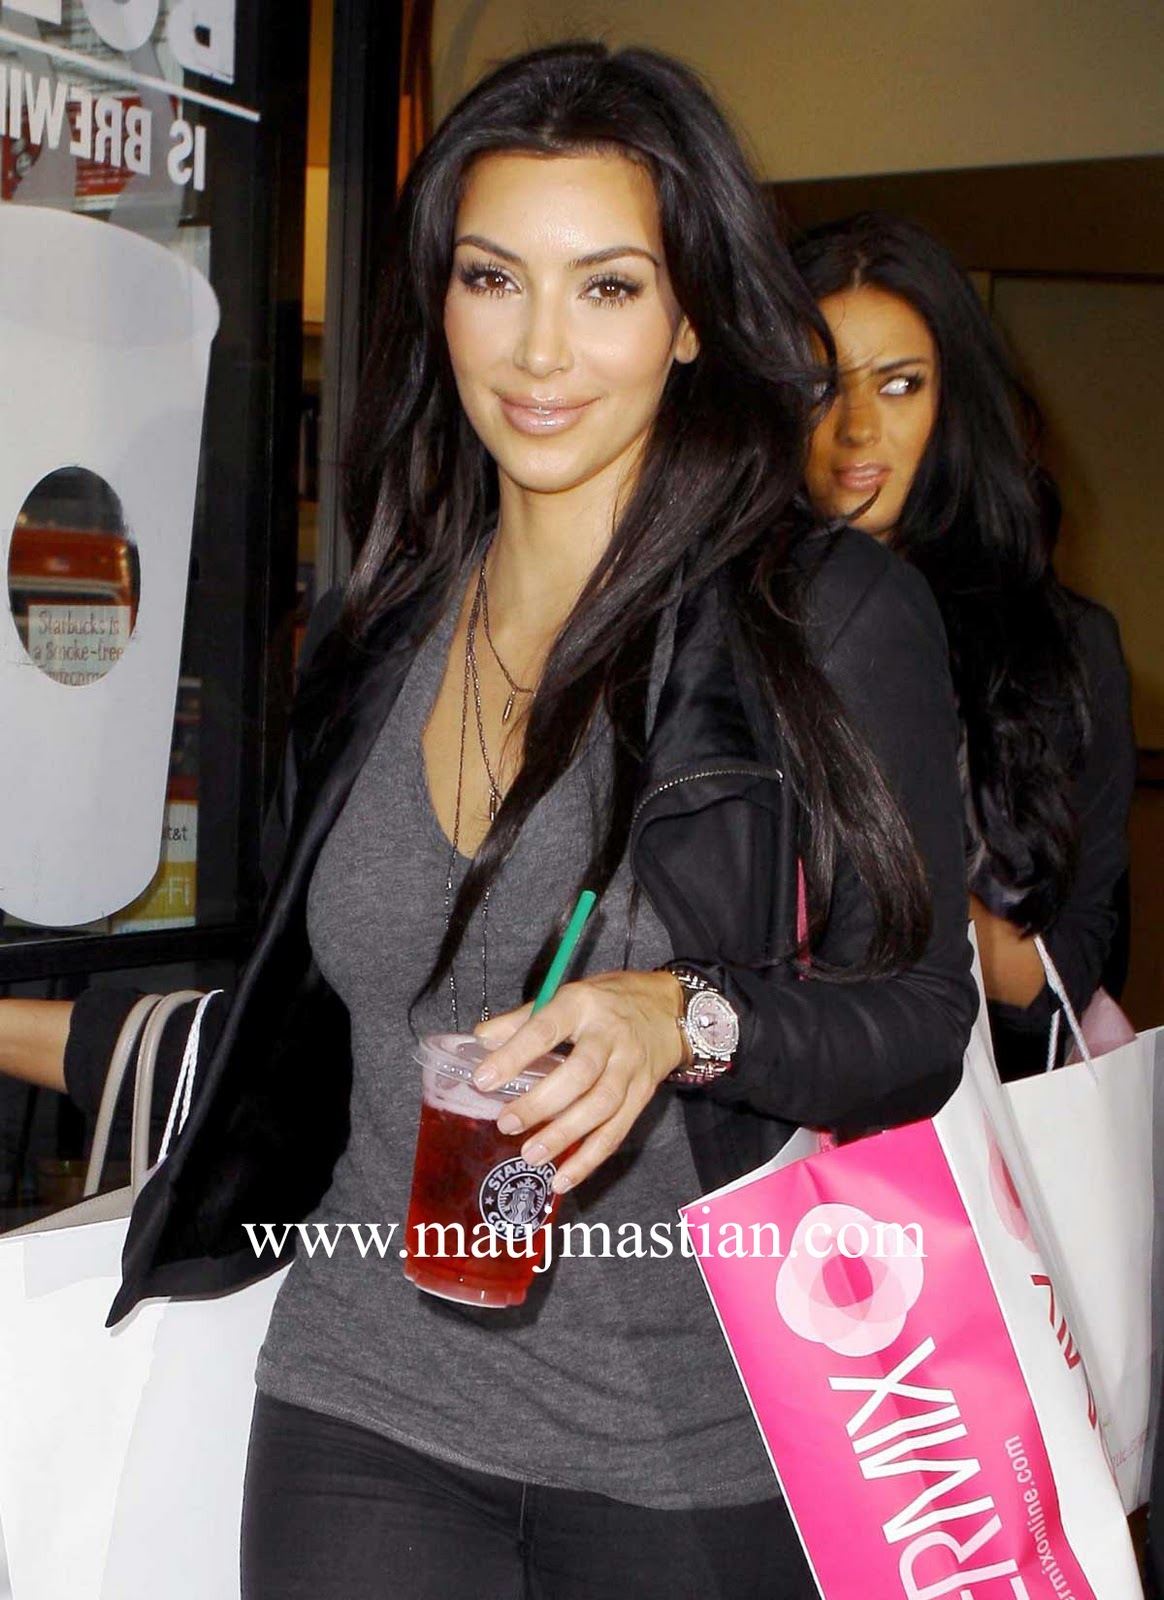 http://2.bp.blogspot.com/_iVee2DUZW3M/TR2eHv7fBHI/AAAAAAAACzY/PCJeoBTsEiE/s1600/1278016671_kim_kardashian_secret_cleave.jpg